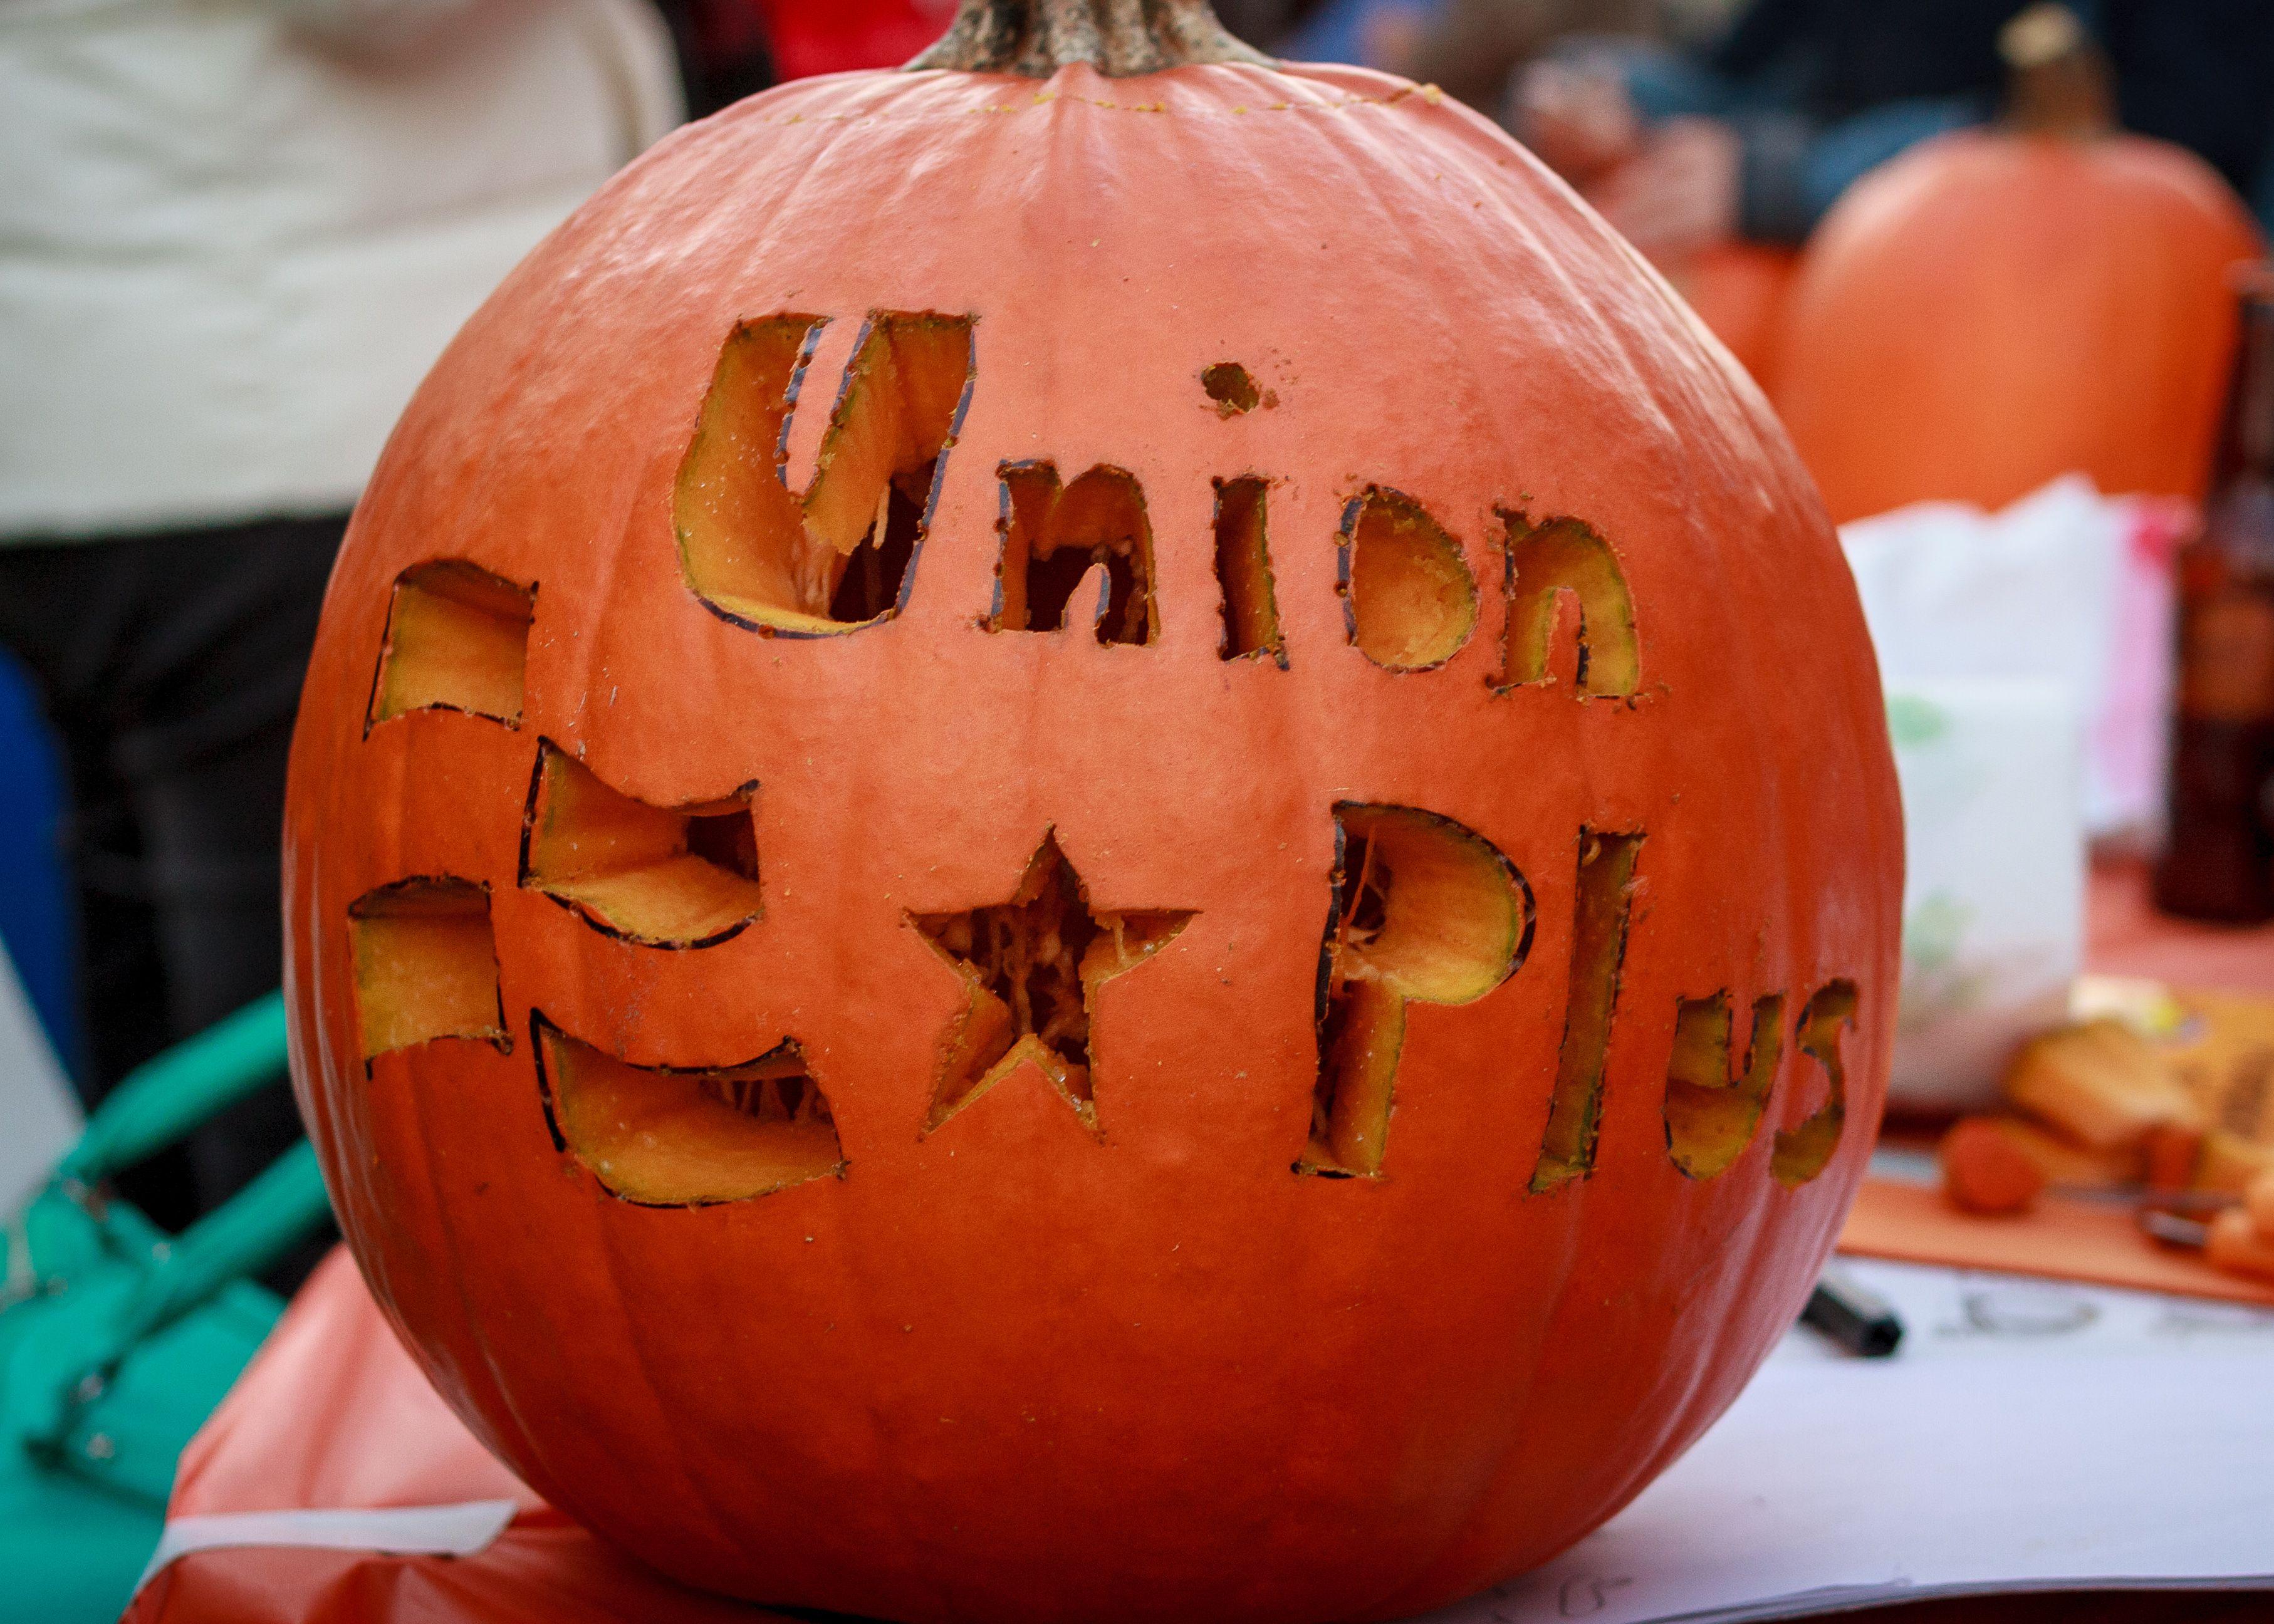 Union plus pumpkin carving fun pumpkin carving